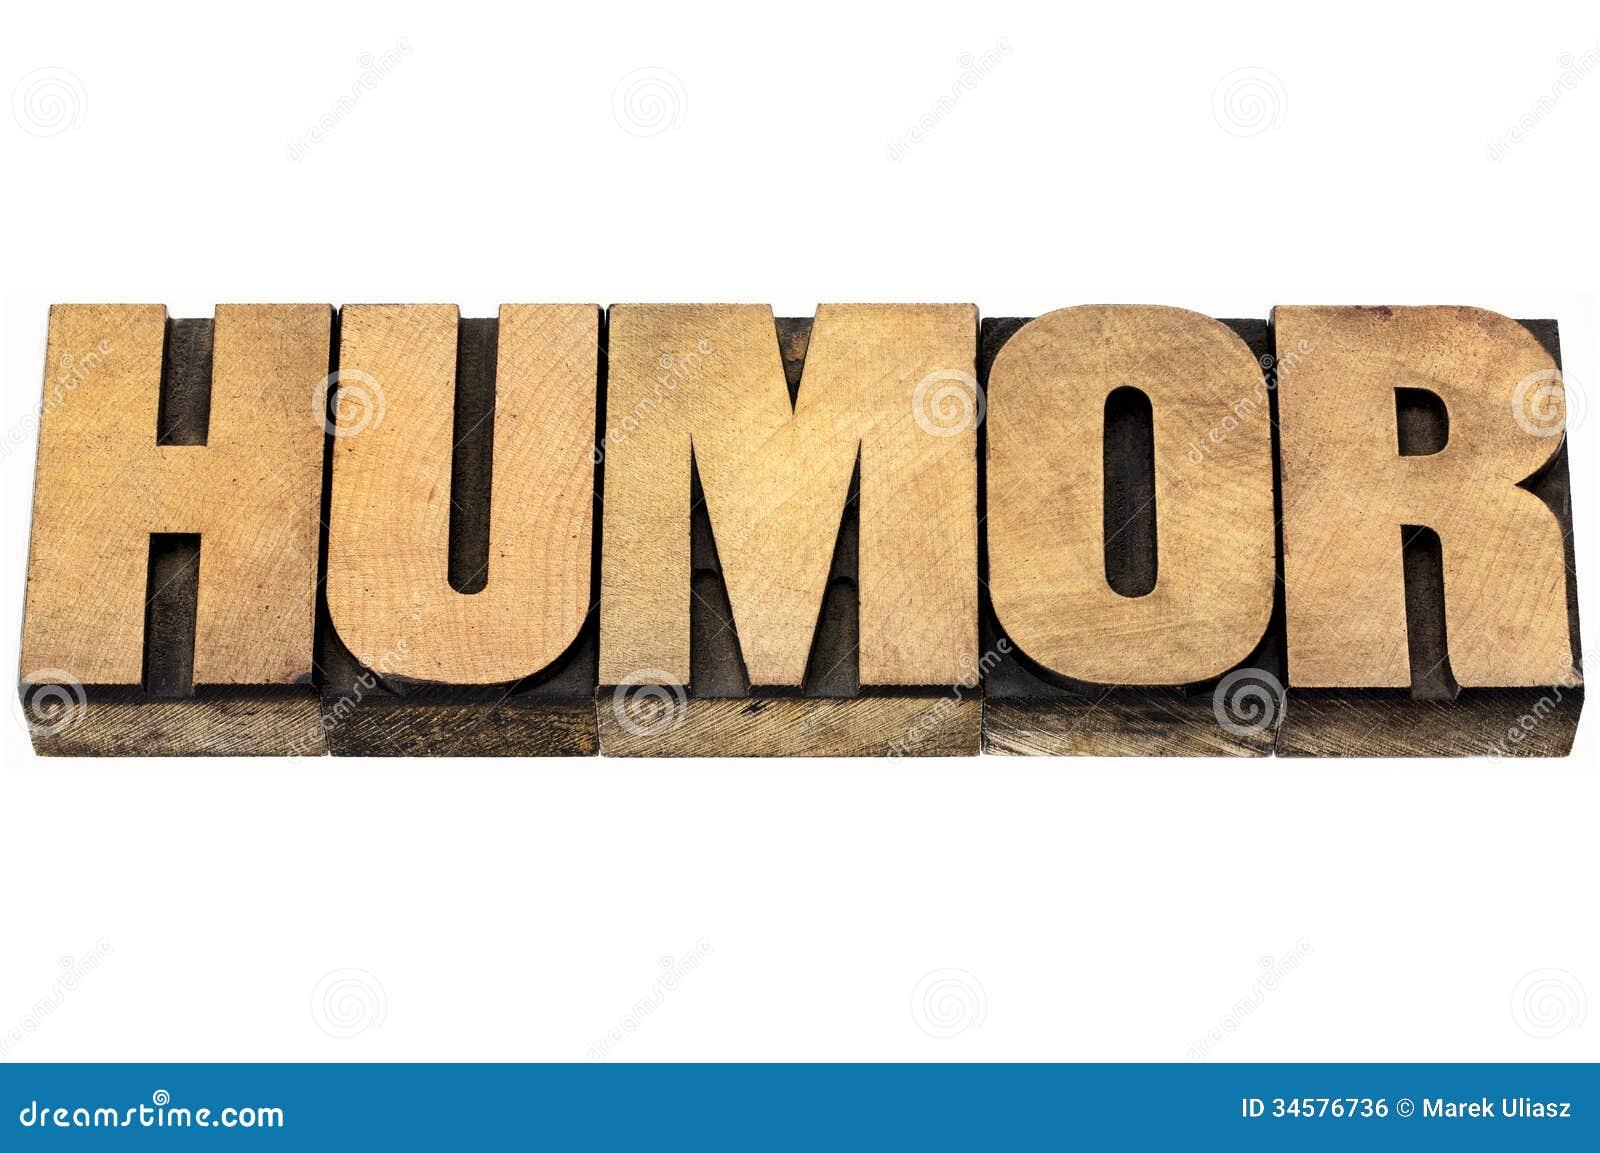 Humor word in wood type stock photo. Image of grain, text ...